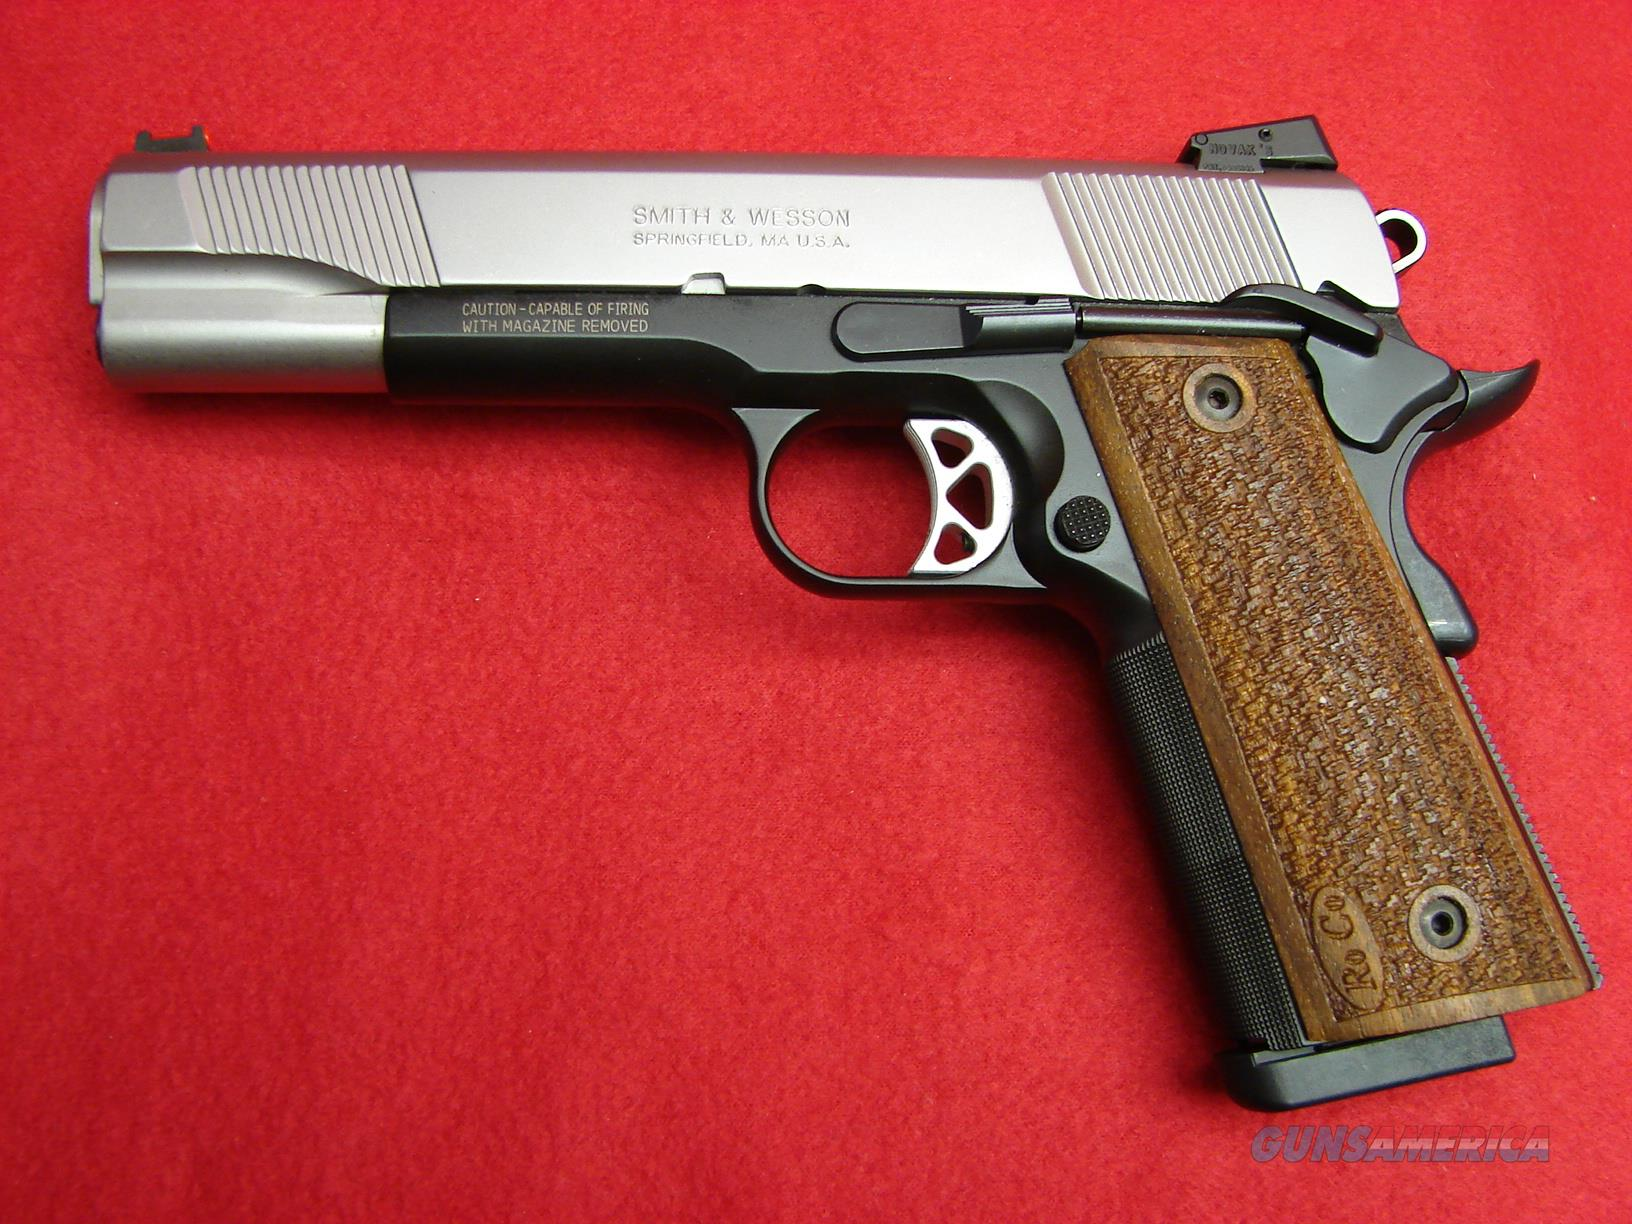 Smith & Wesson SW1911 - Pro Series - 45acp - NIB  Guns > Pistols > Smith & Wesson Pistols - Autos > Steel Frame